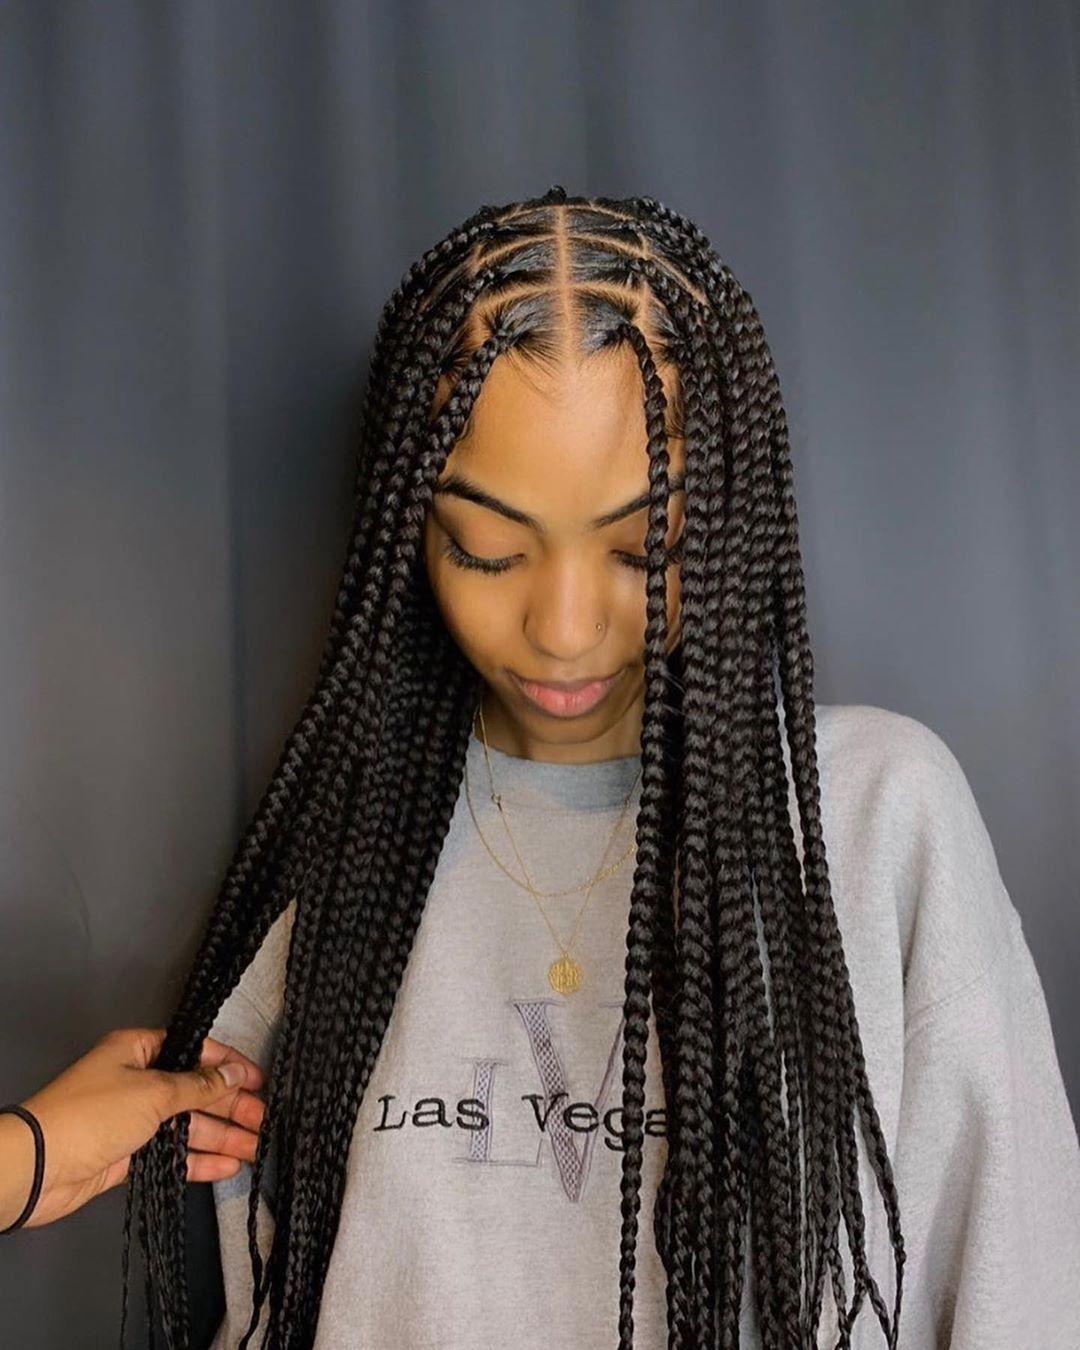 Knotless Braids In 2020 Braids For Short Hair Black Girl Braided Hairstyles Girls Hairstyles Braids